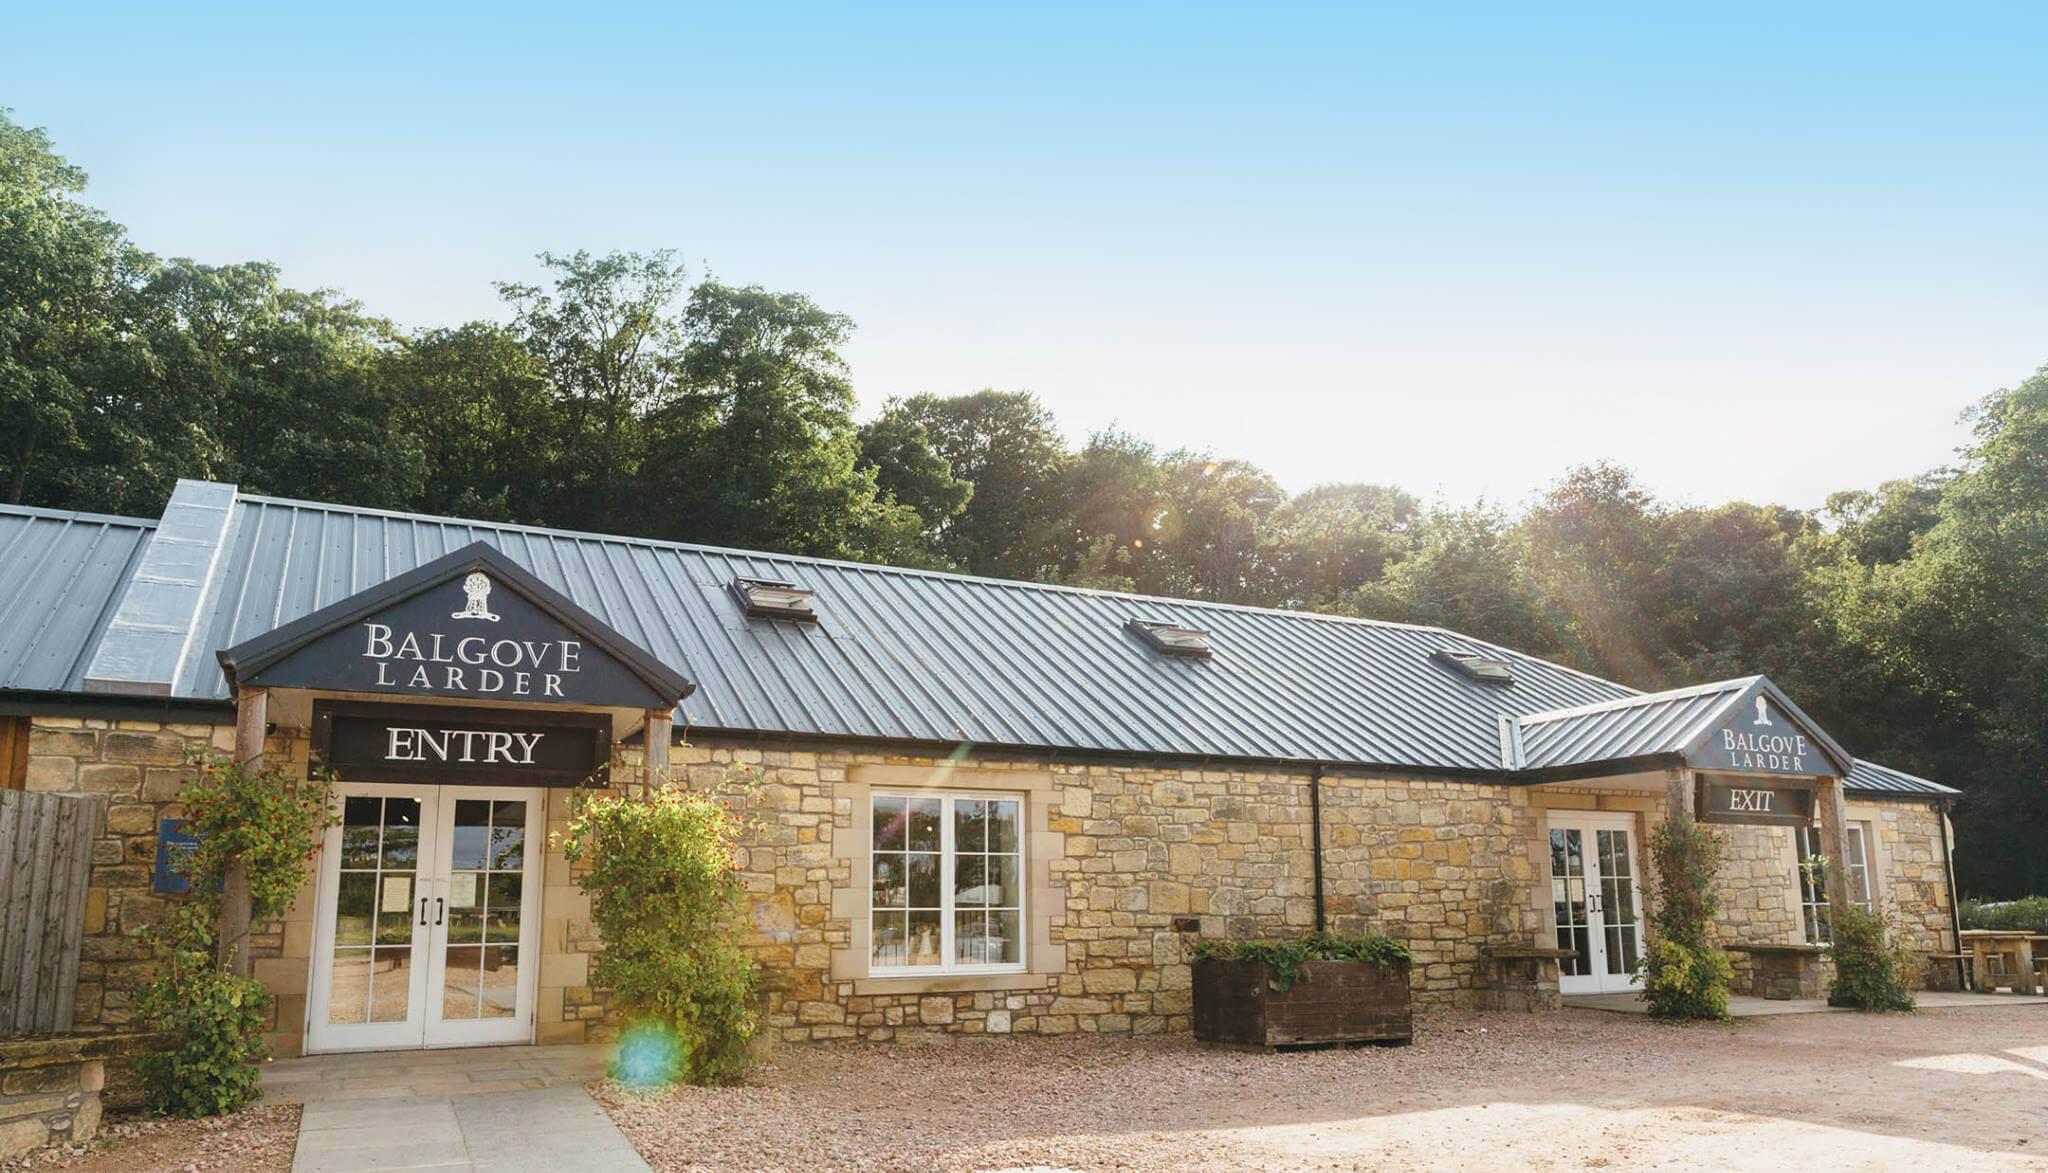 Great British Food Awards highlight three Fife farm shops